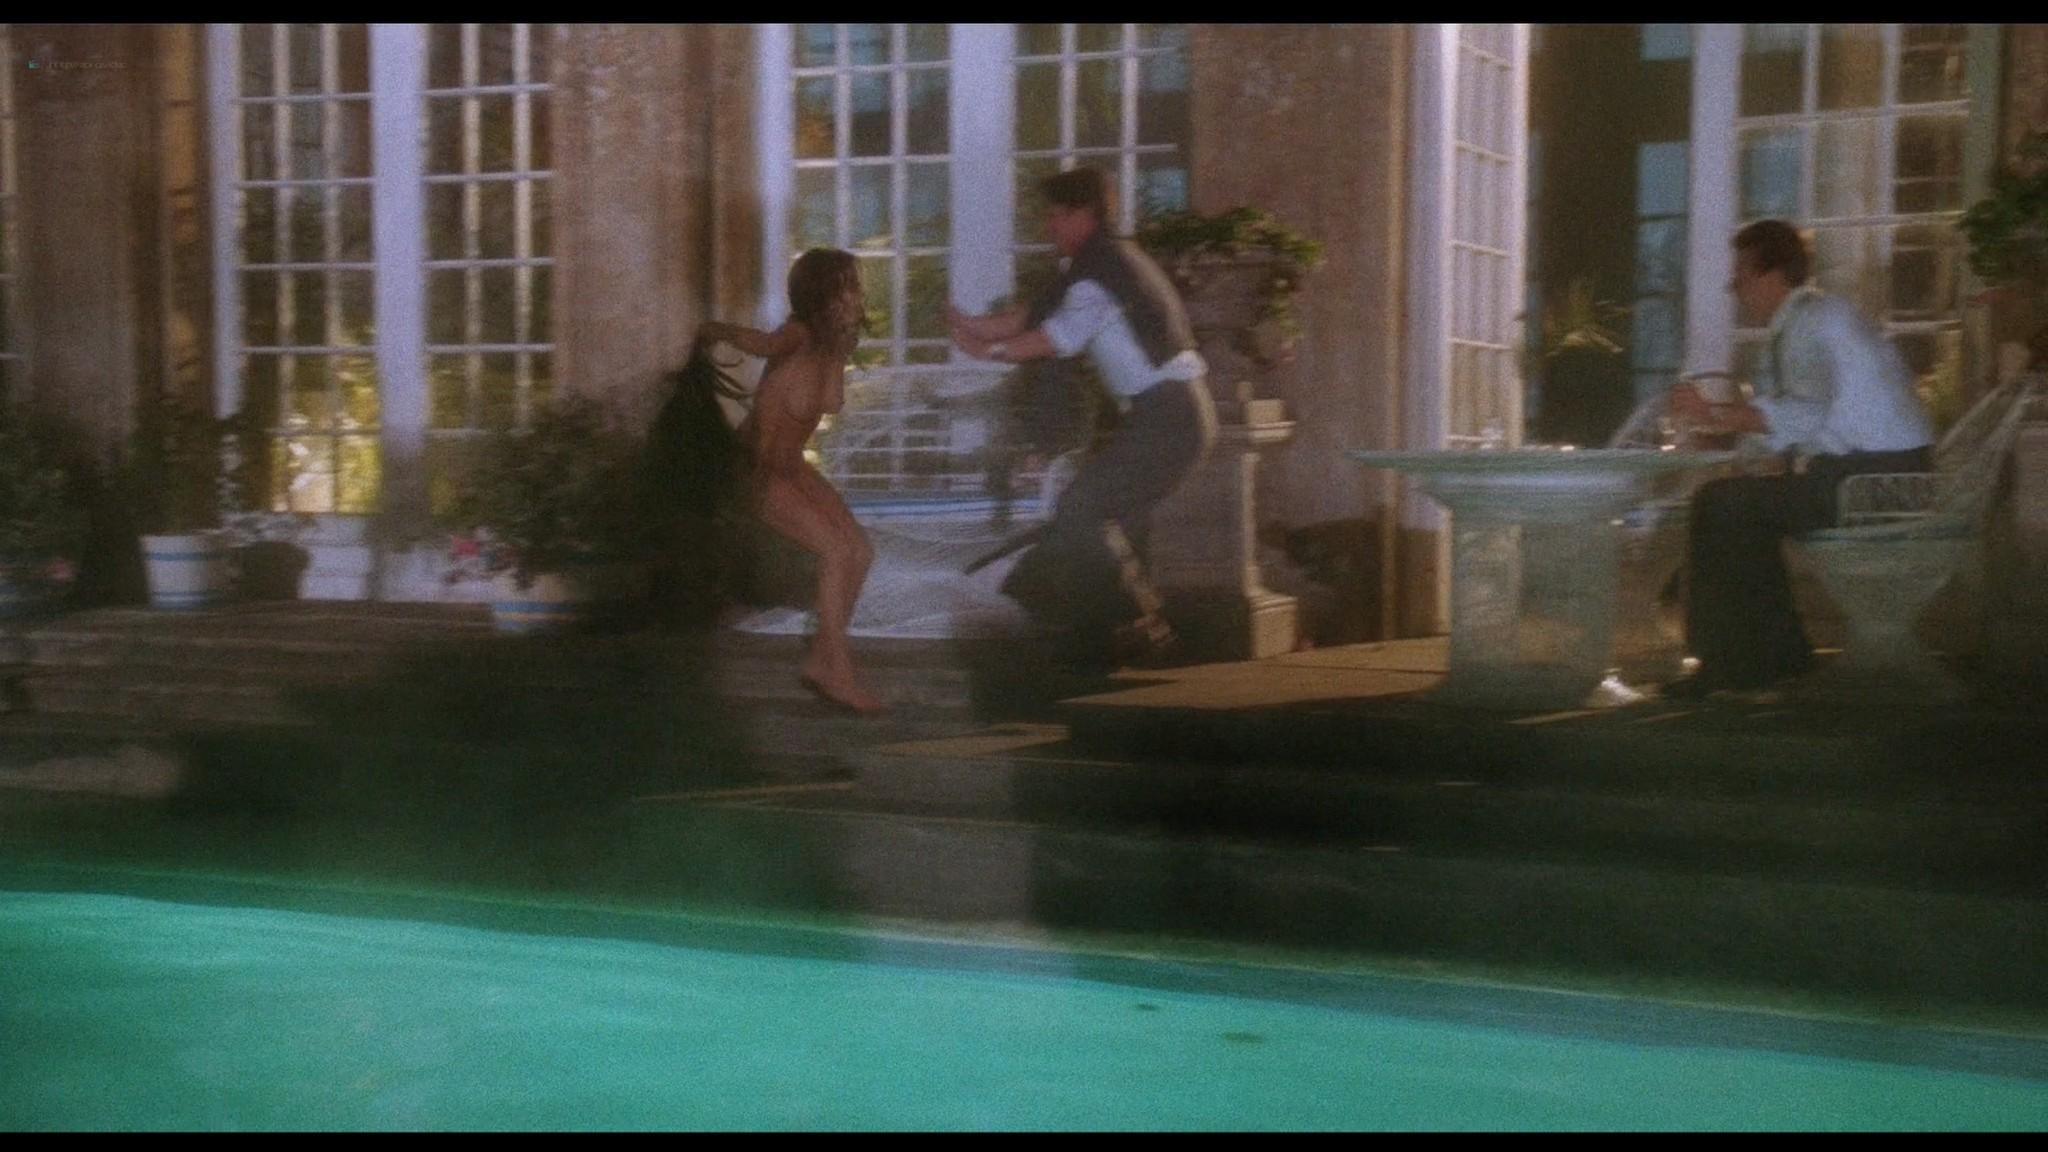 Bridget Fonda nude butt boobs Britt Ekland nude Joanne Whalley hot - Scandal (1989) HD 1080p BluRay (5)